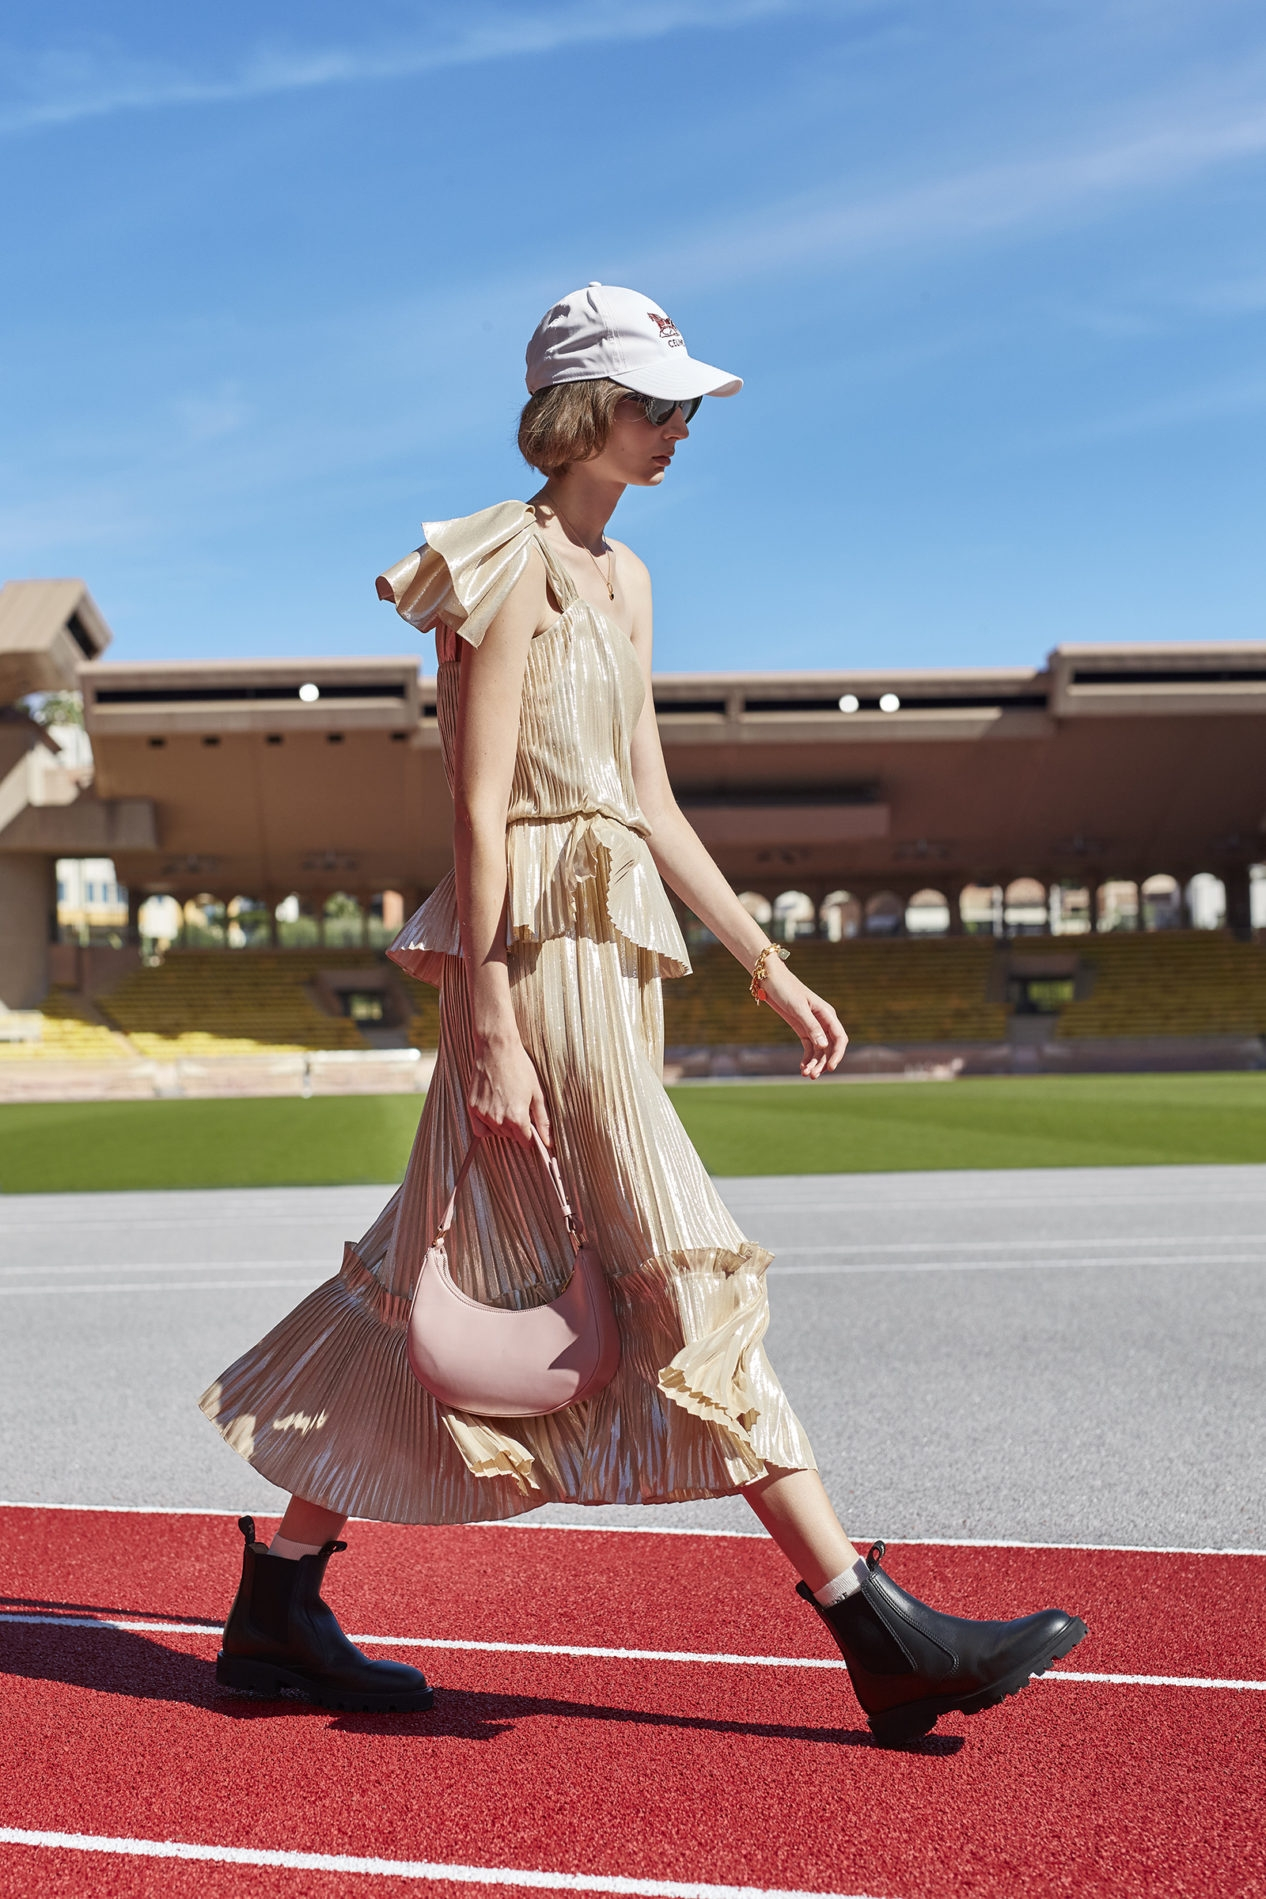 Французская романтика и спорт: Celine показали новую коллекцию весна-лето 2021 (ФОТО) - фото №4